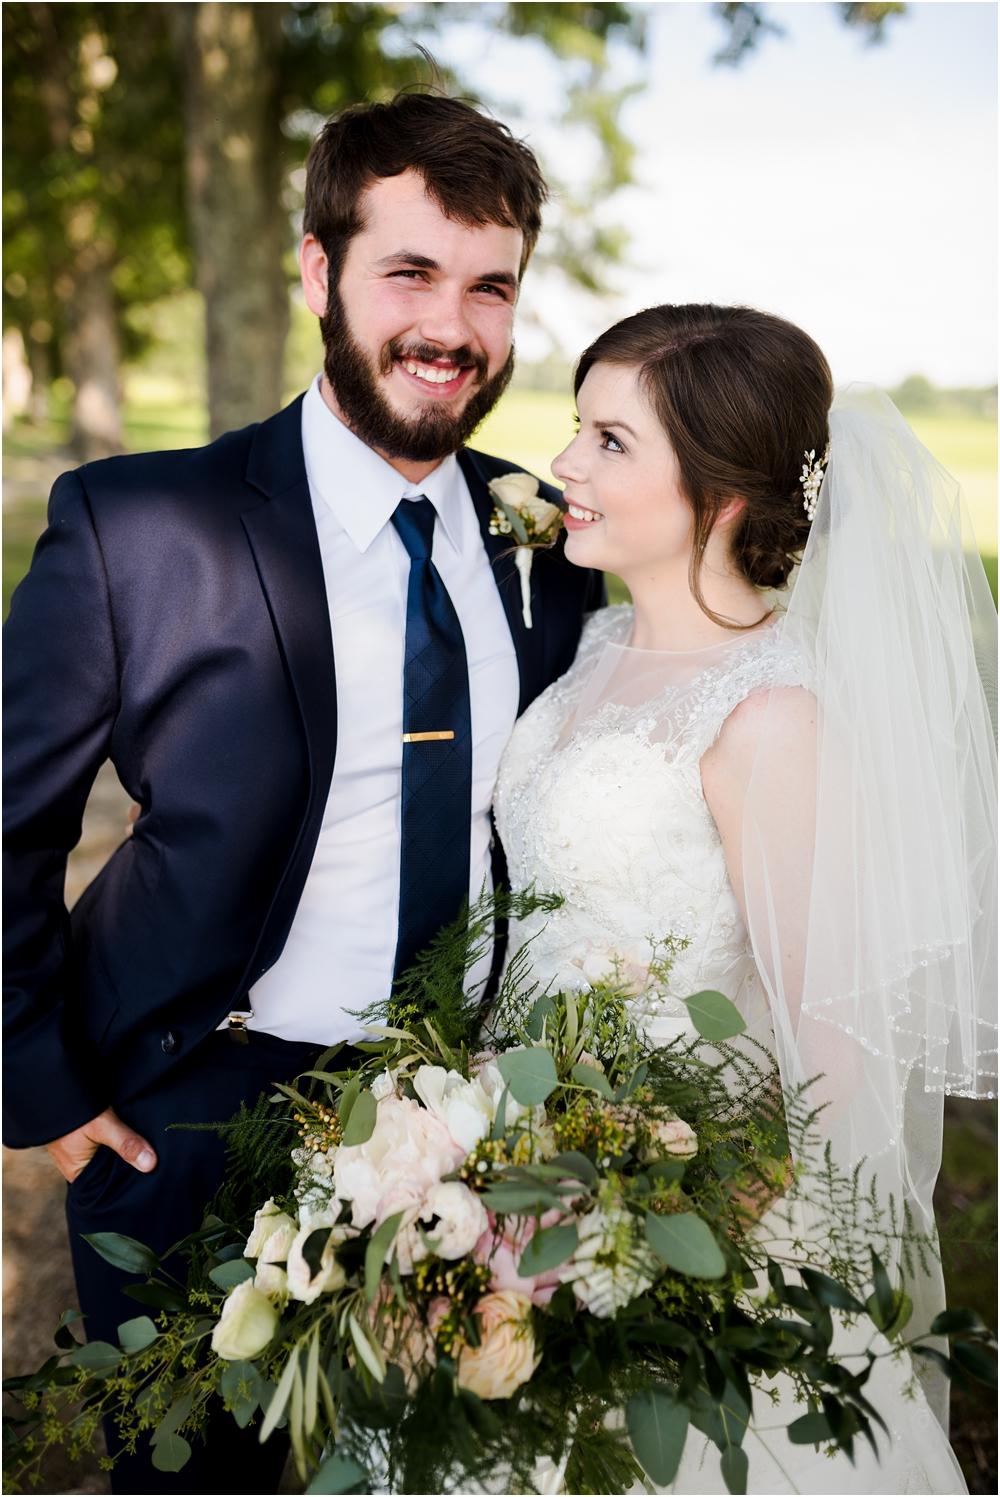 marianna-florida-wedding-photographer-kiersten-grant-59.jpg